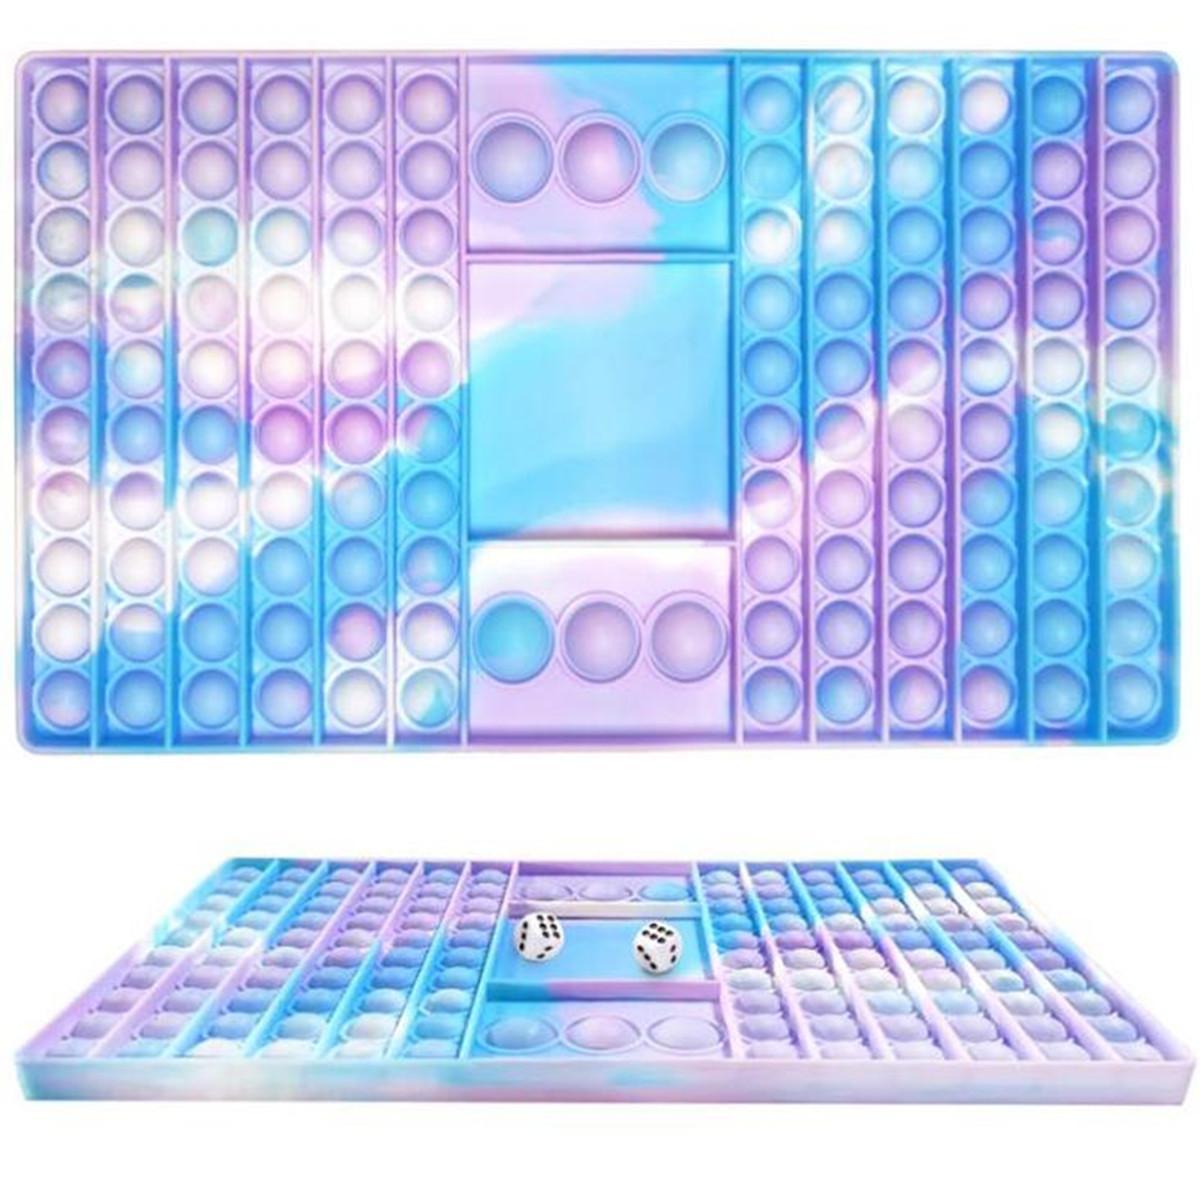 Fidget Push Desktop Toy Push Puzzle Tischtisch Dekompression Tie-Dye Chess Board Finger Bubble Sensory Educational Toys 2021 Neueste FY2760